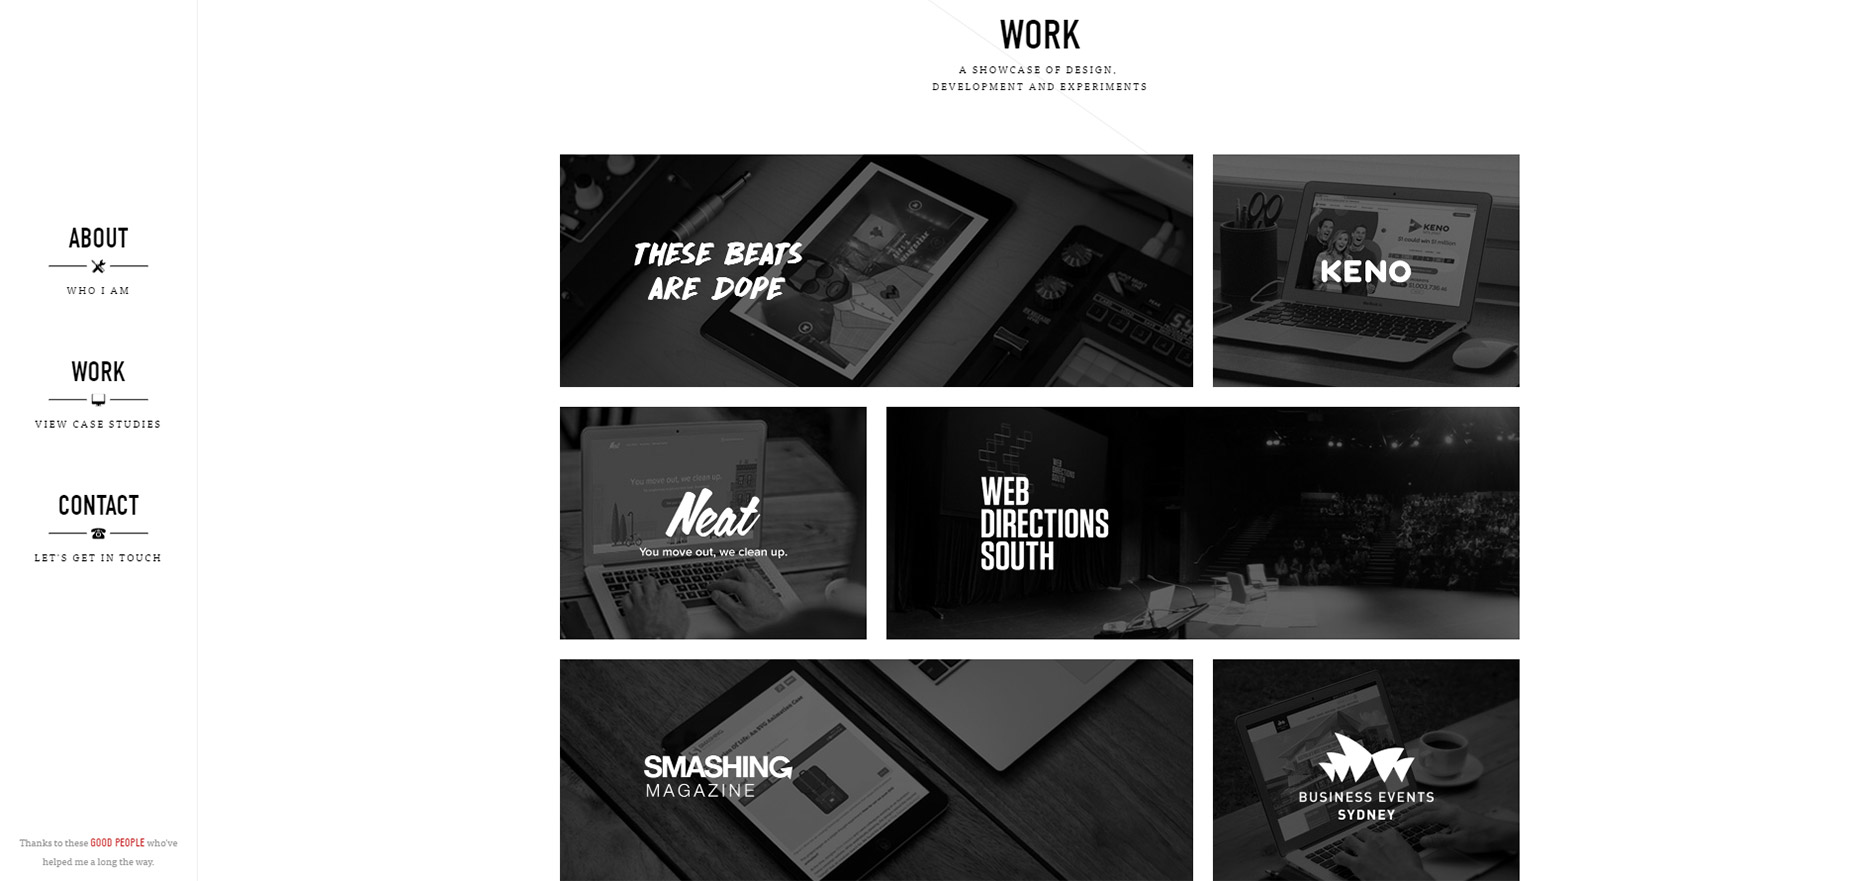 08-michael-ngo-portfolio-site